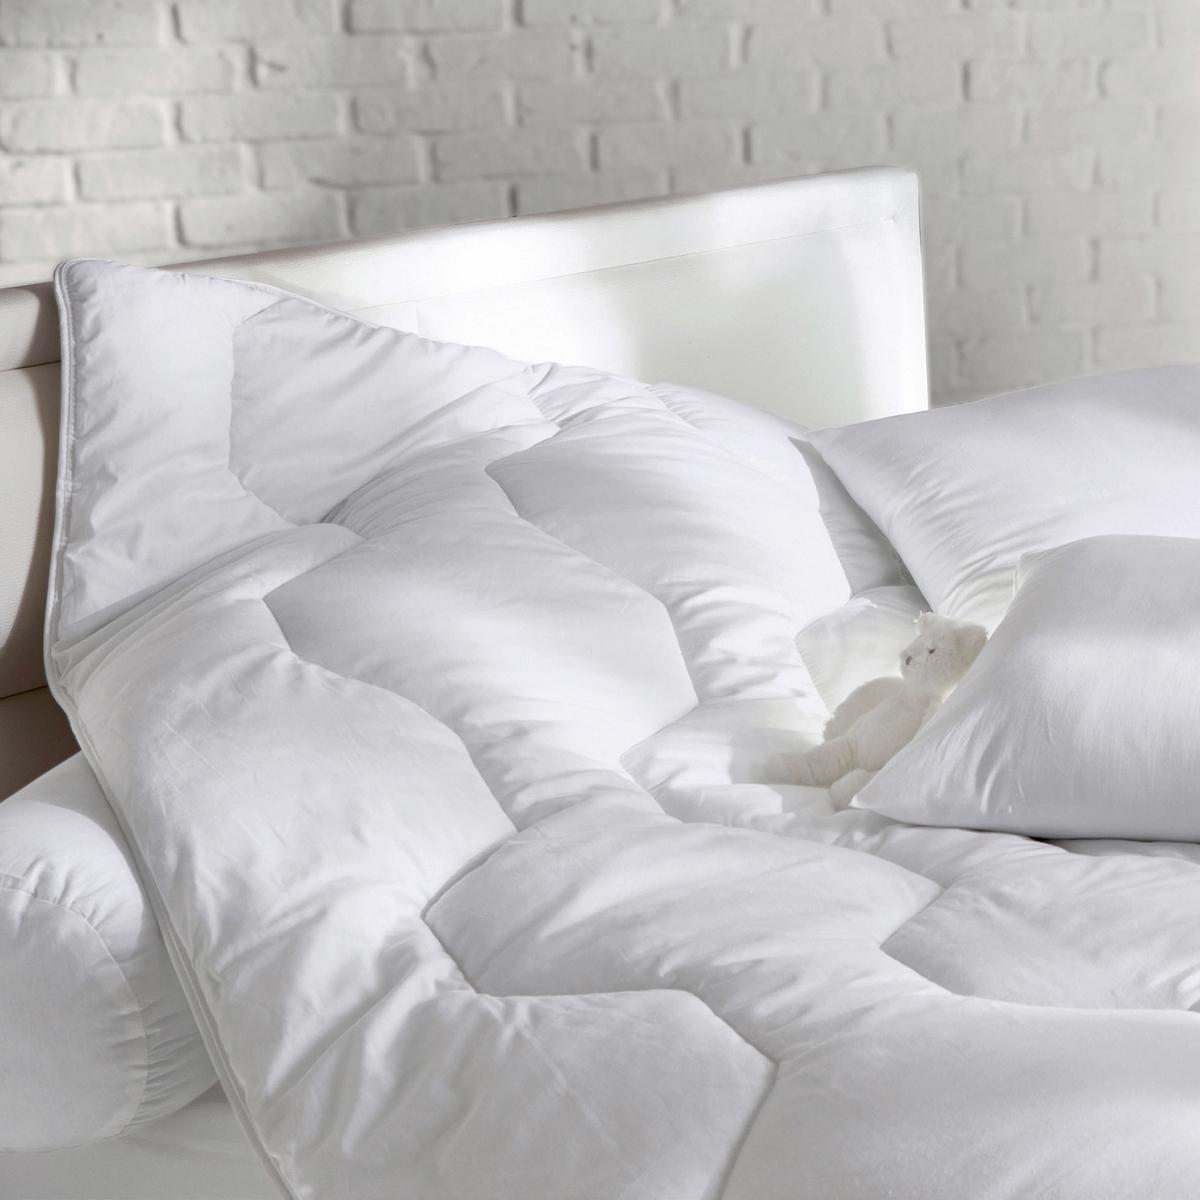 цена Одеяло La Redoute Синтетическое гм с обработкой Santol 200 x 200 см белый онлайн в 2017 году